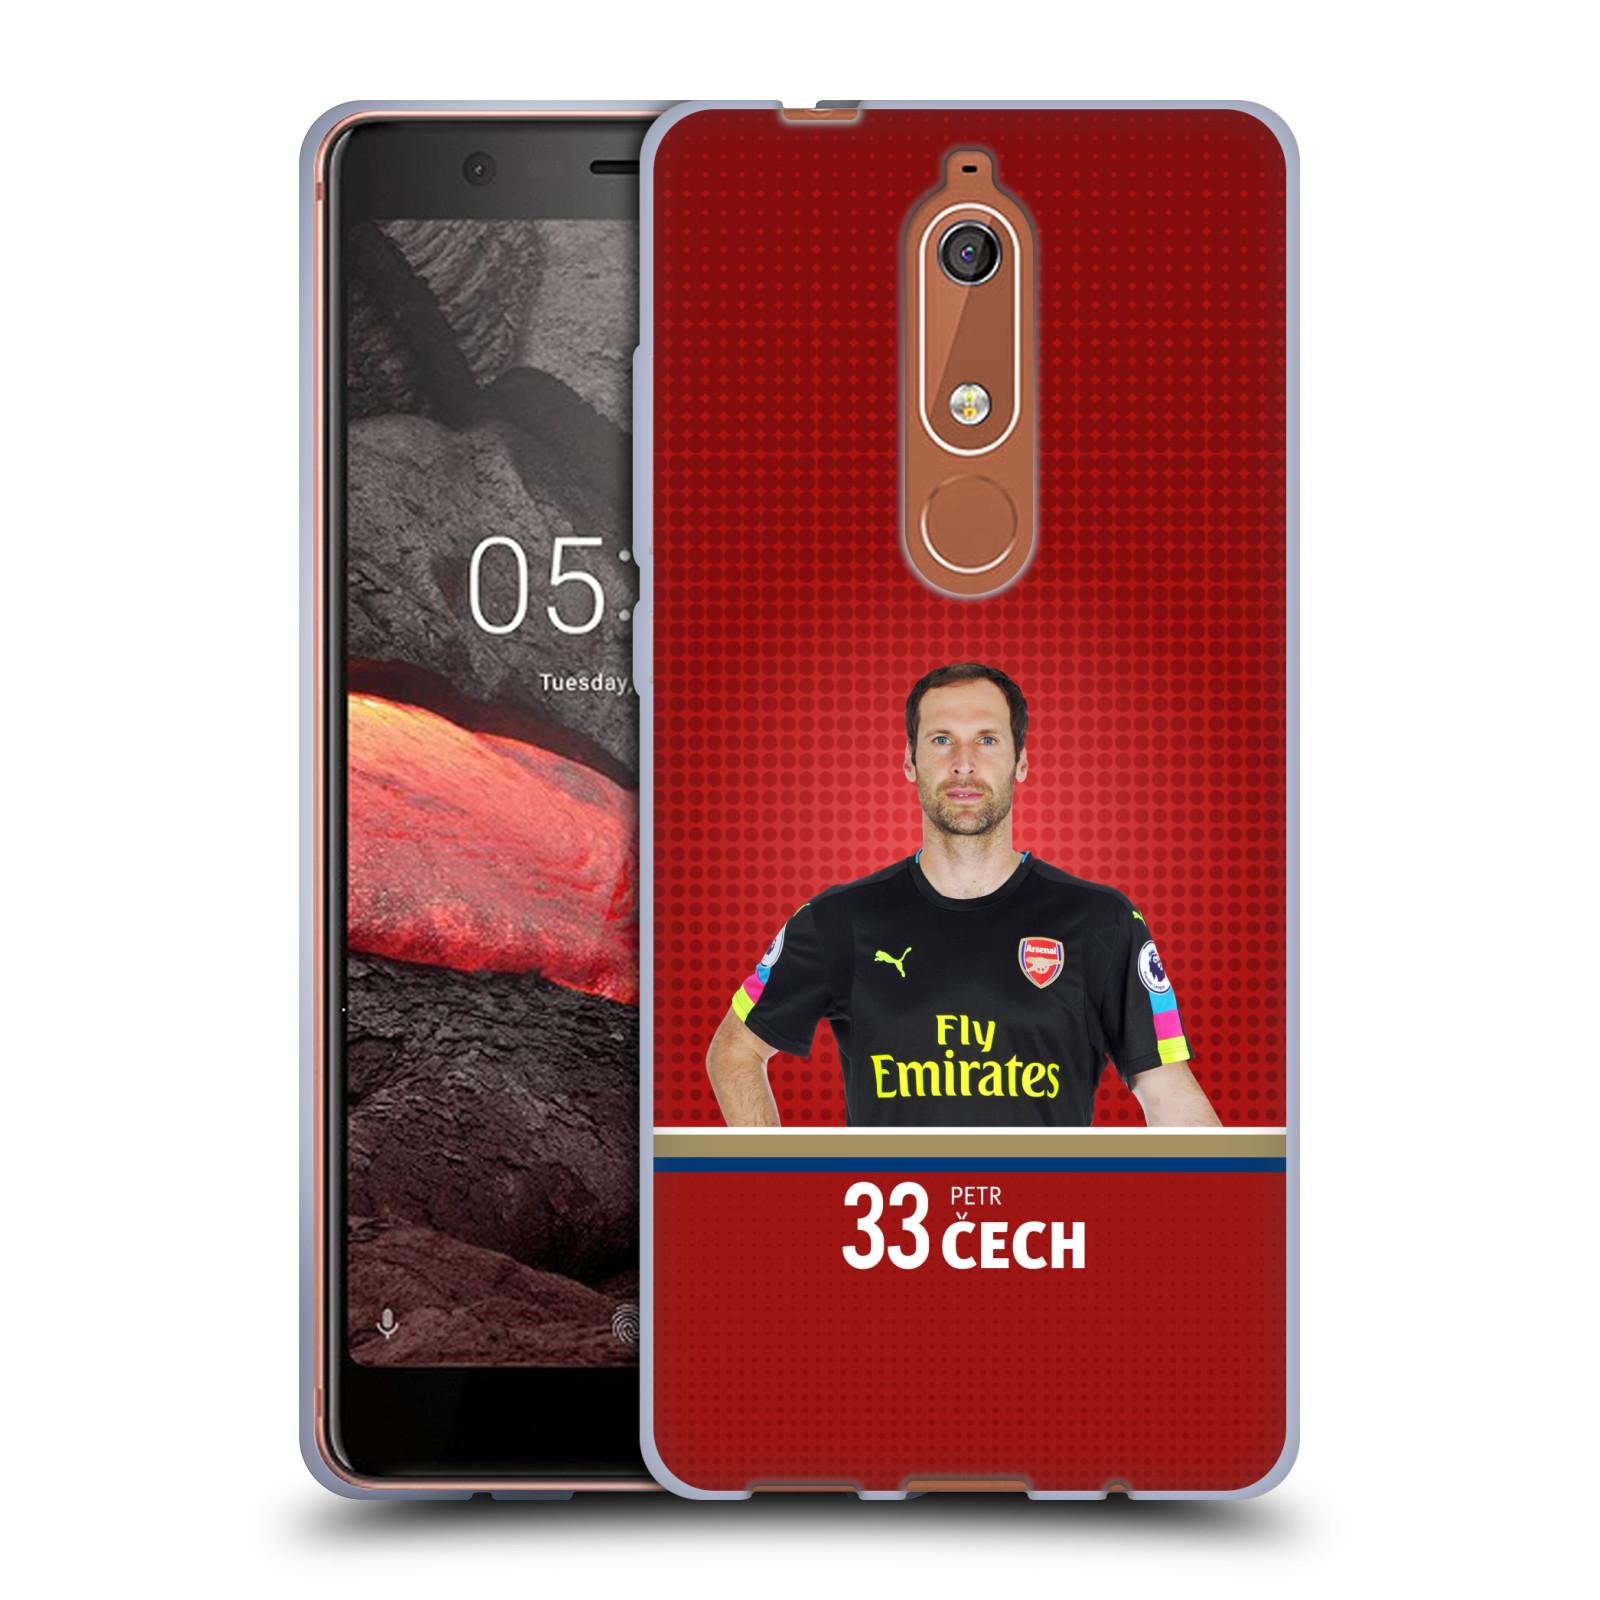 Silikonové pouzdro na mobil Nokia 5.1 - Head Case - Arsenal FC - Petr Čech